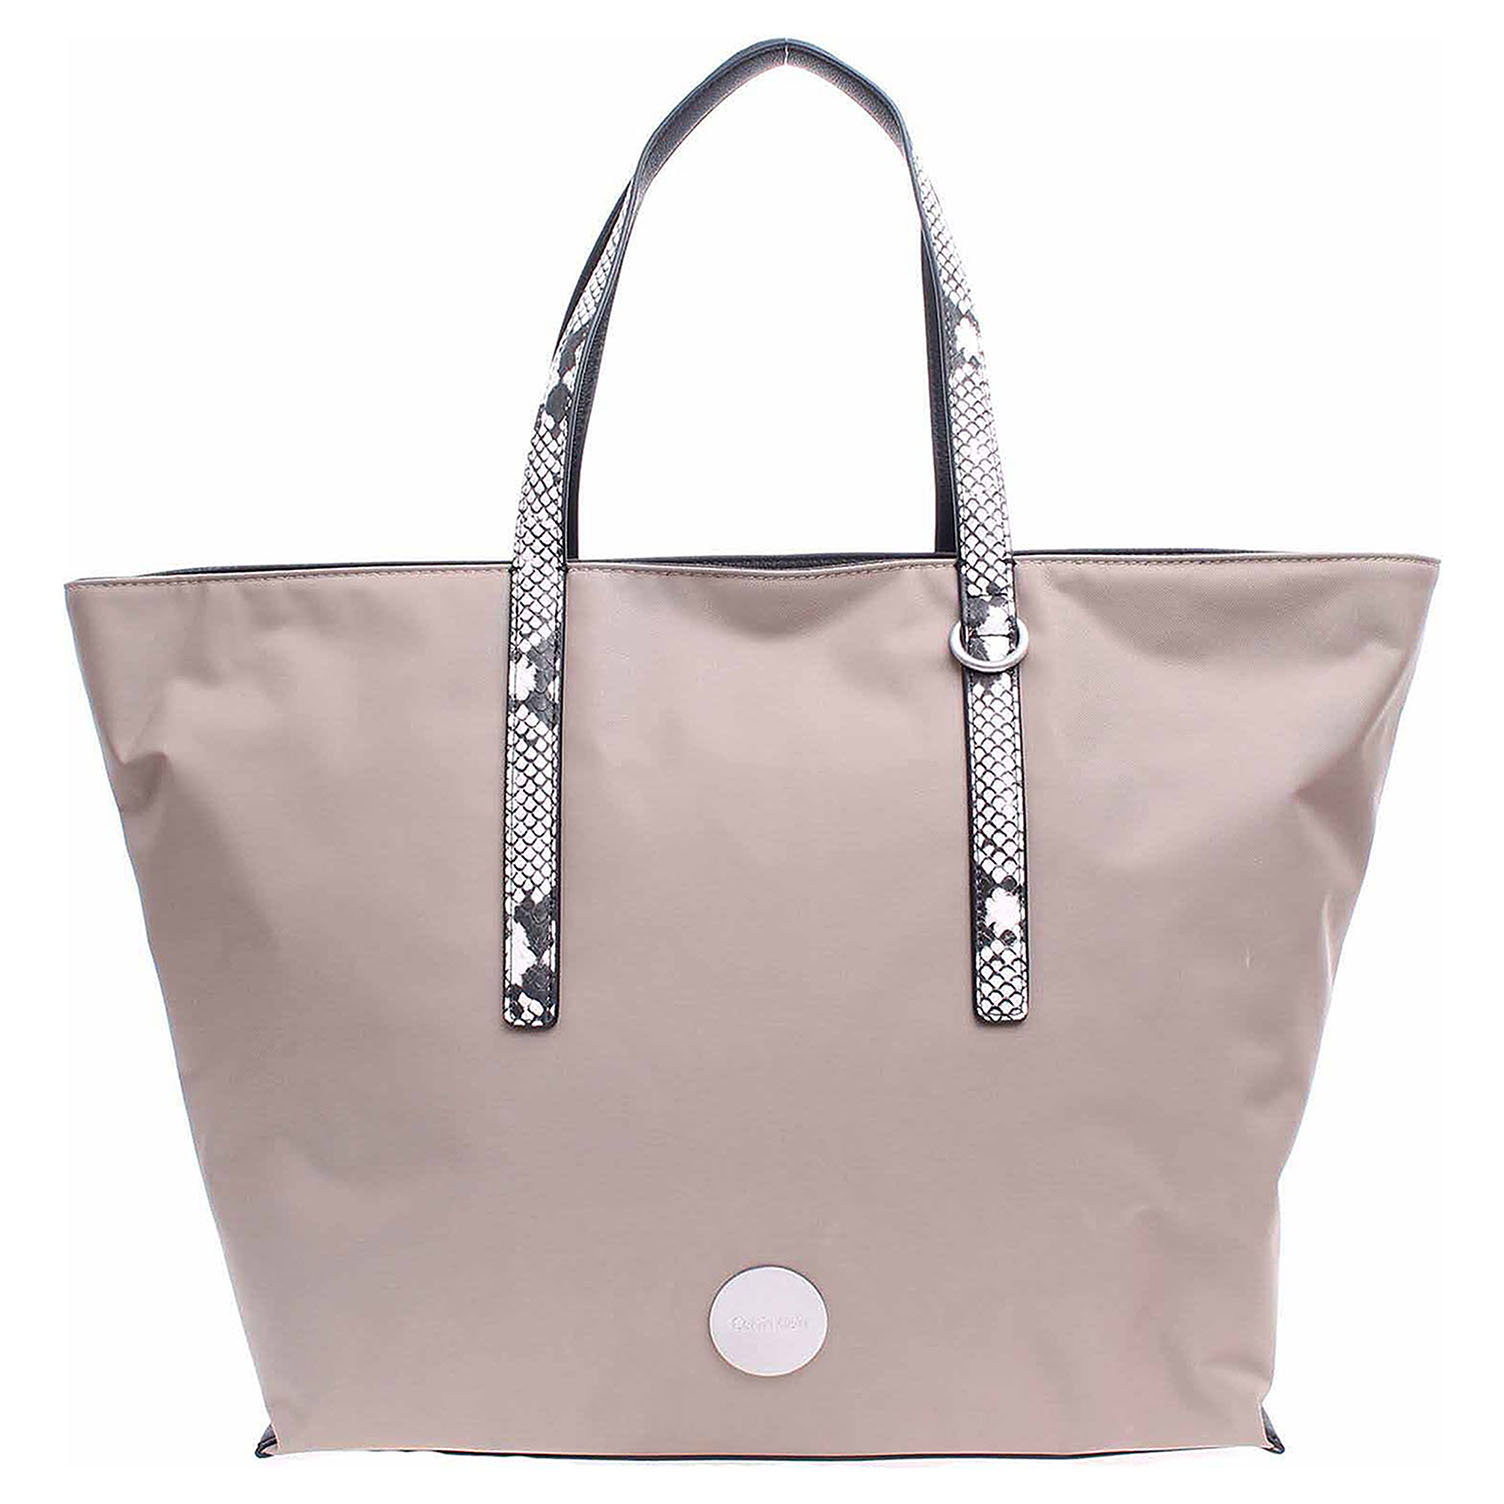 Calvin Klein dámská kabelka K60K602635068 béžová 1